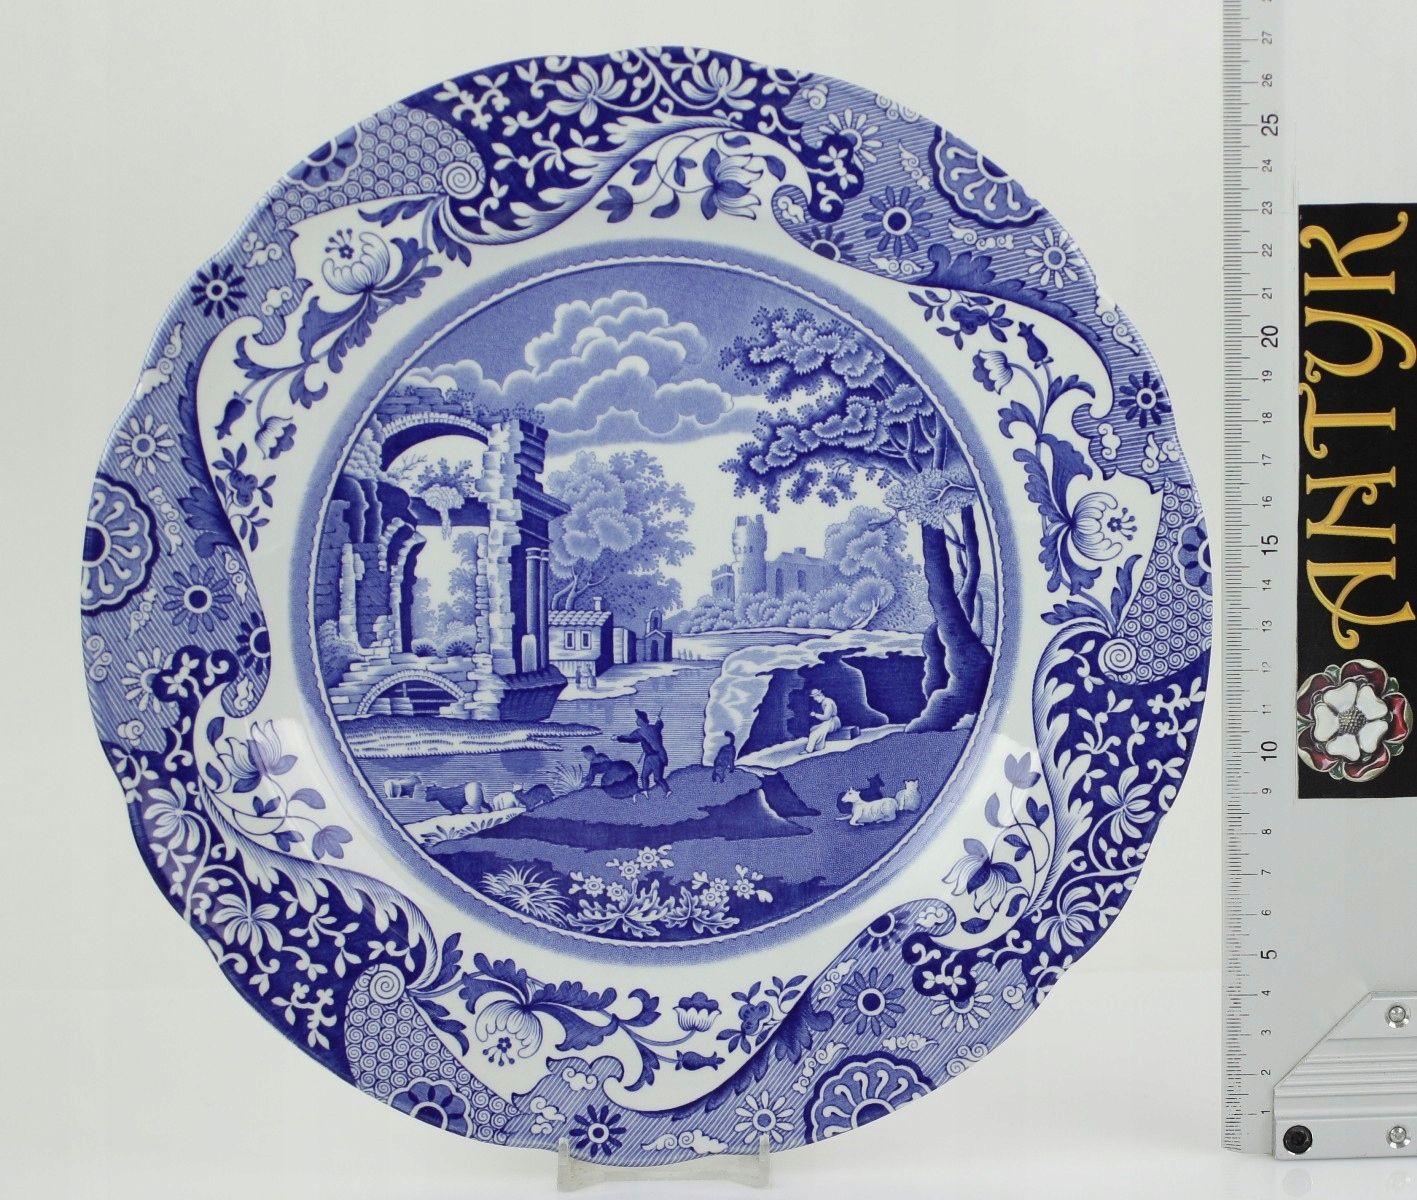 Antyk Spode S Italian Talerz 27cm 7938718619 Oficjalne Archiwum Allegro China Patterns Italian Dinnerware Blue And White China